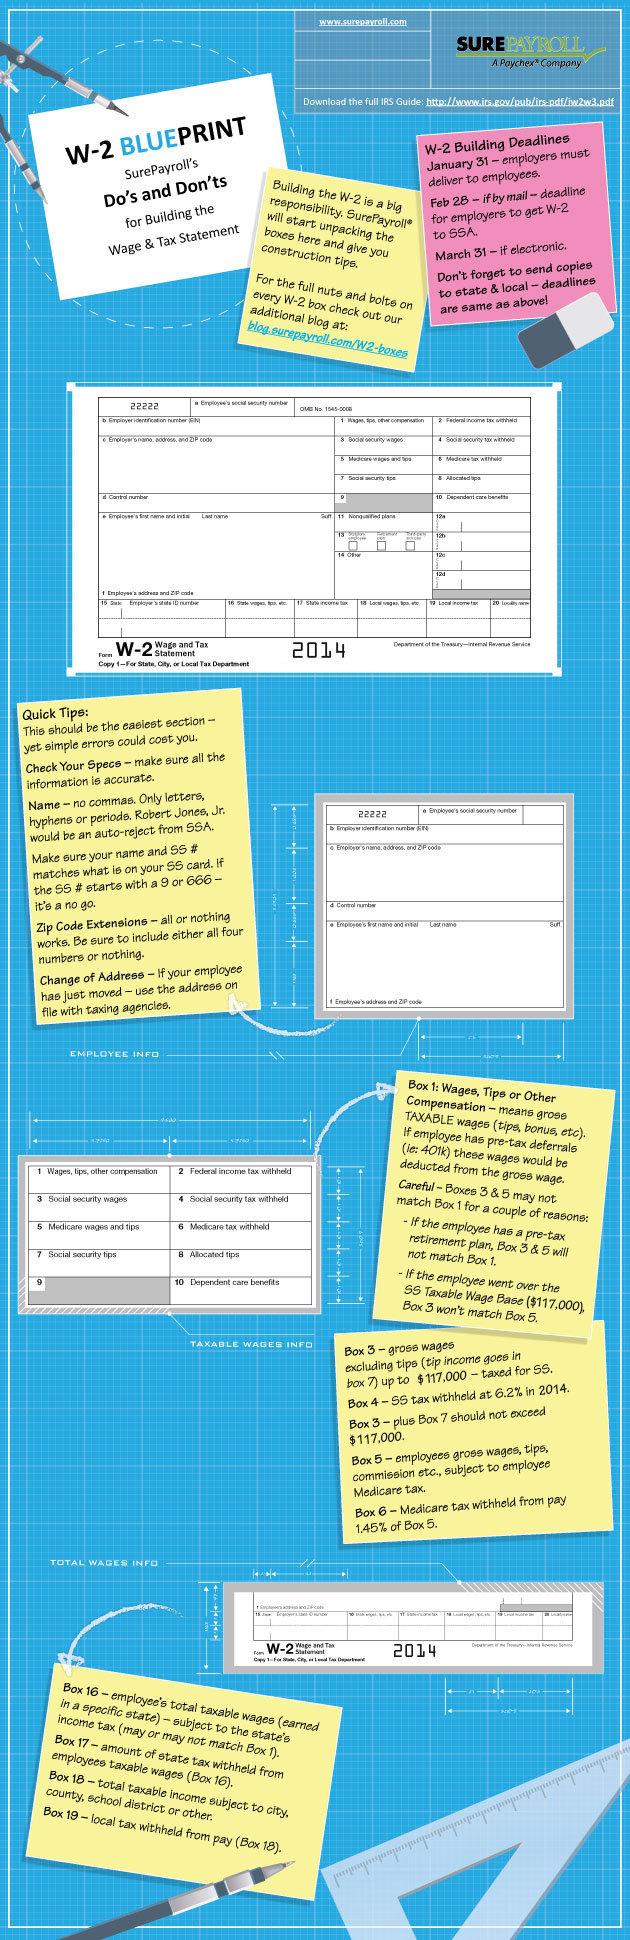 W-2 Blueprint infographic by SurePayroll